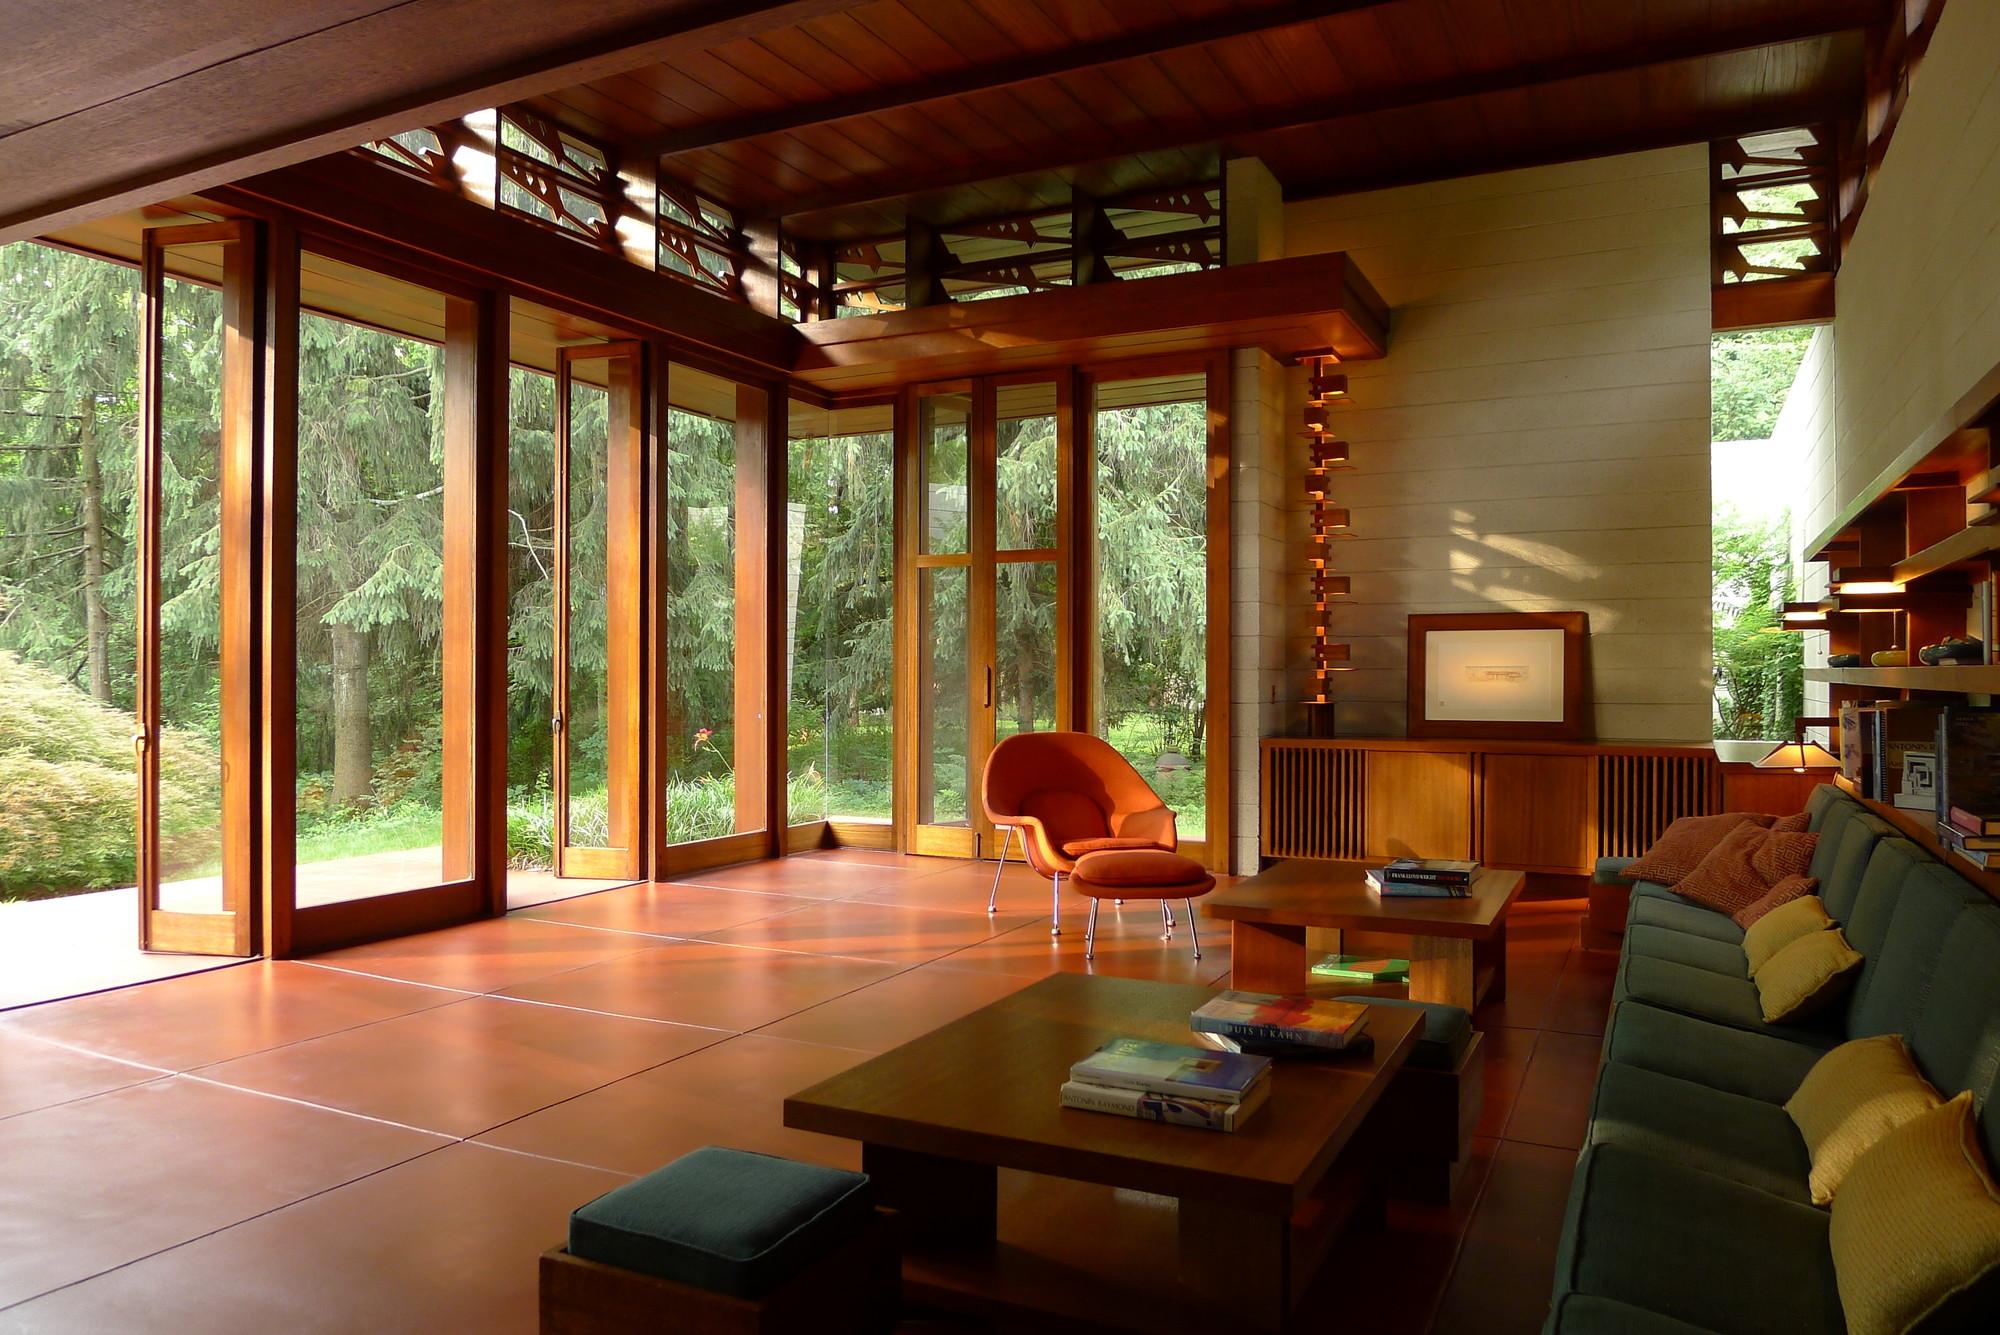 New House Interiors